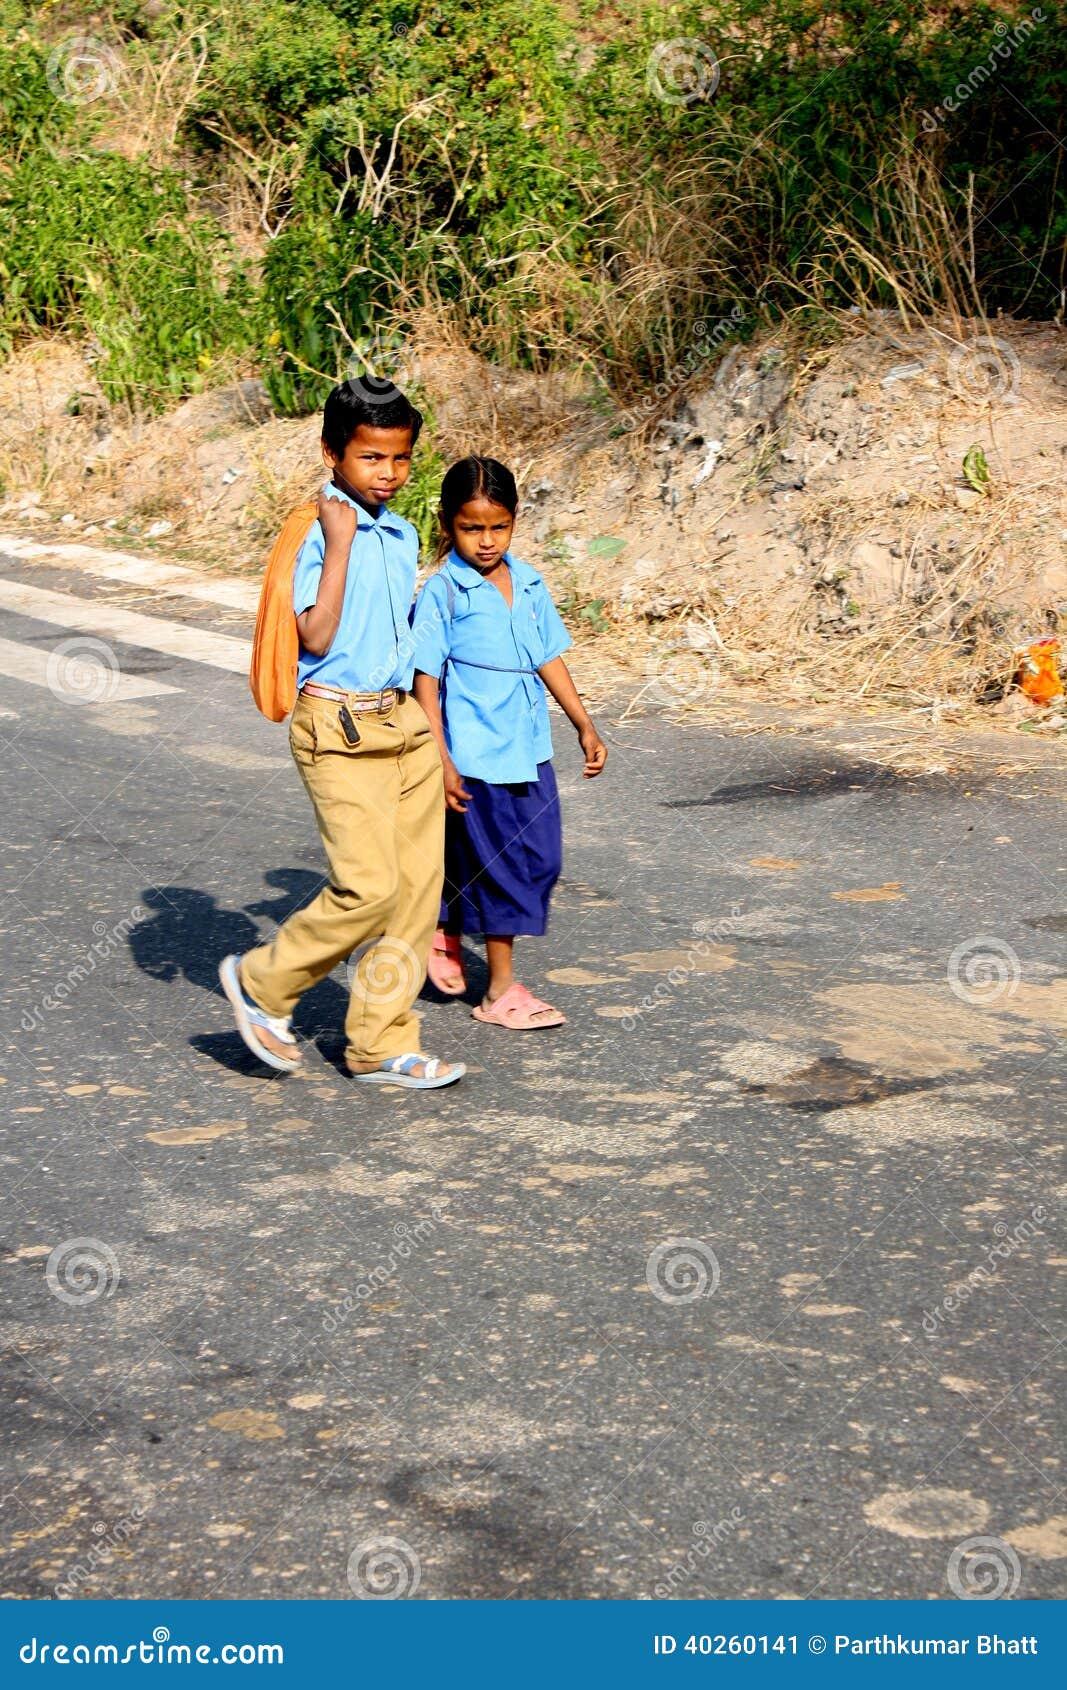 indian little boy sex with little girl